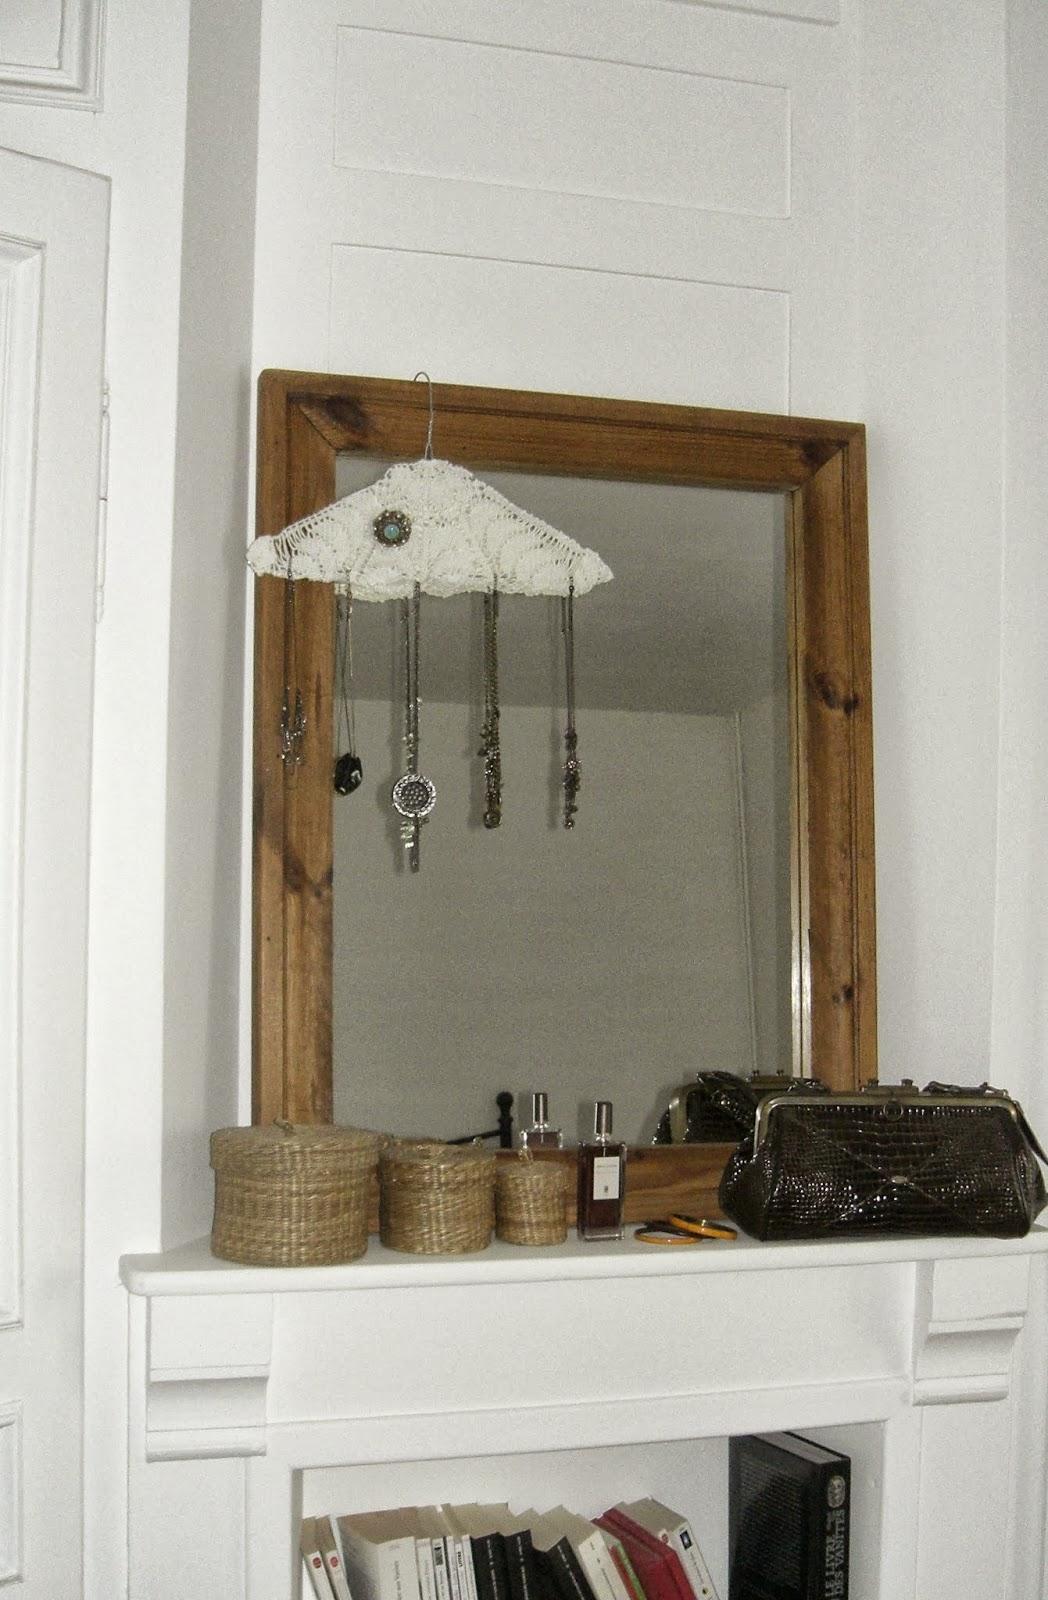 gabulle in wonderland je recycle mes napperons le cintre porte bijoux. Black Bedroom Furniture Sets. Home Design Ideas